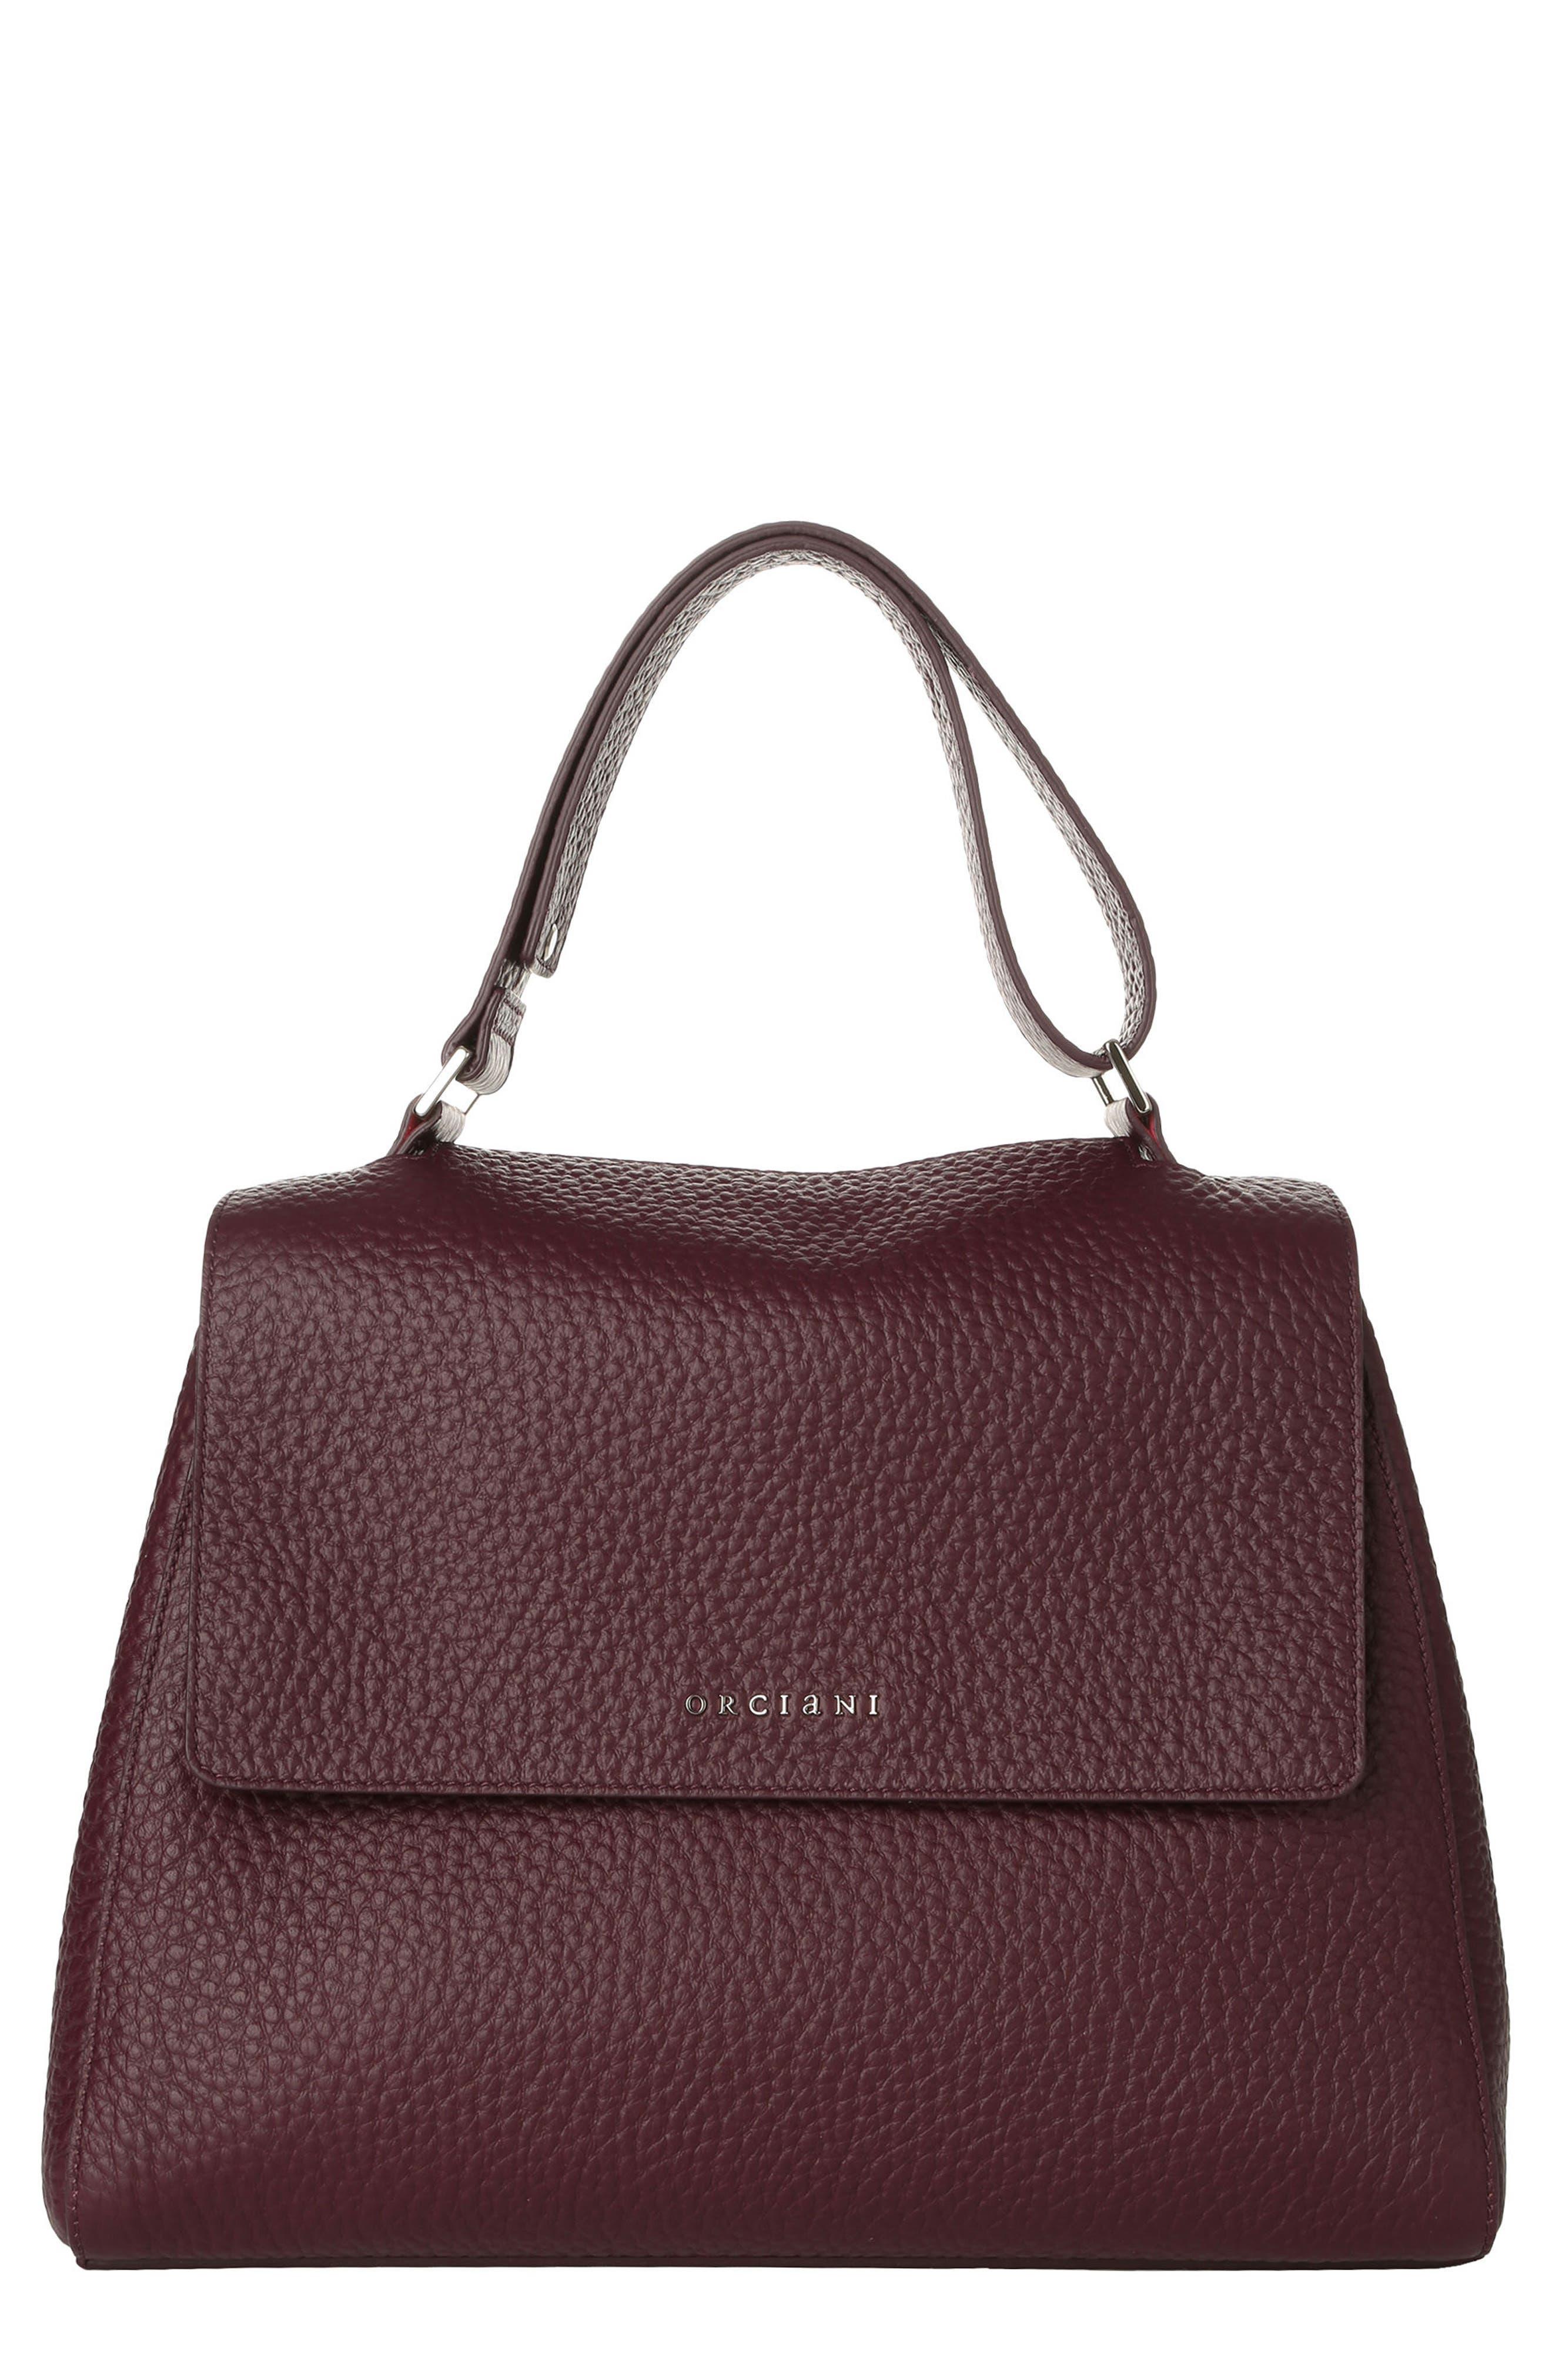 ORCIANI Medium Sveva Soft Leather Top Handle Satchel